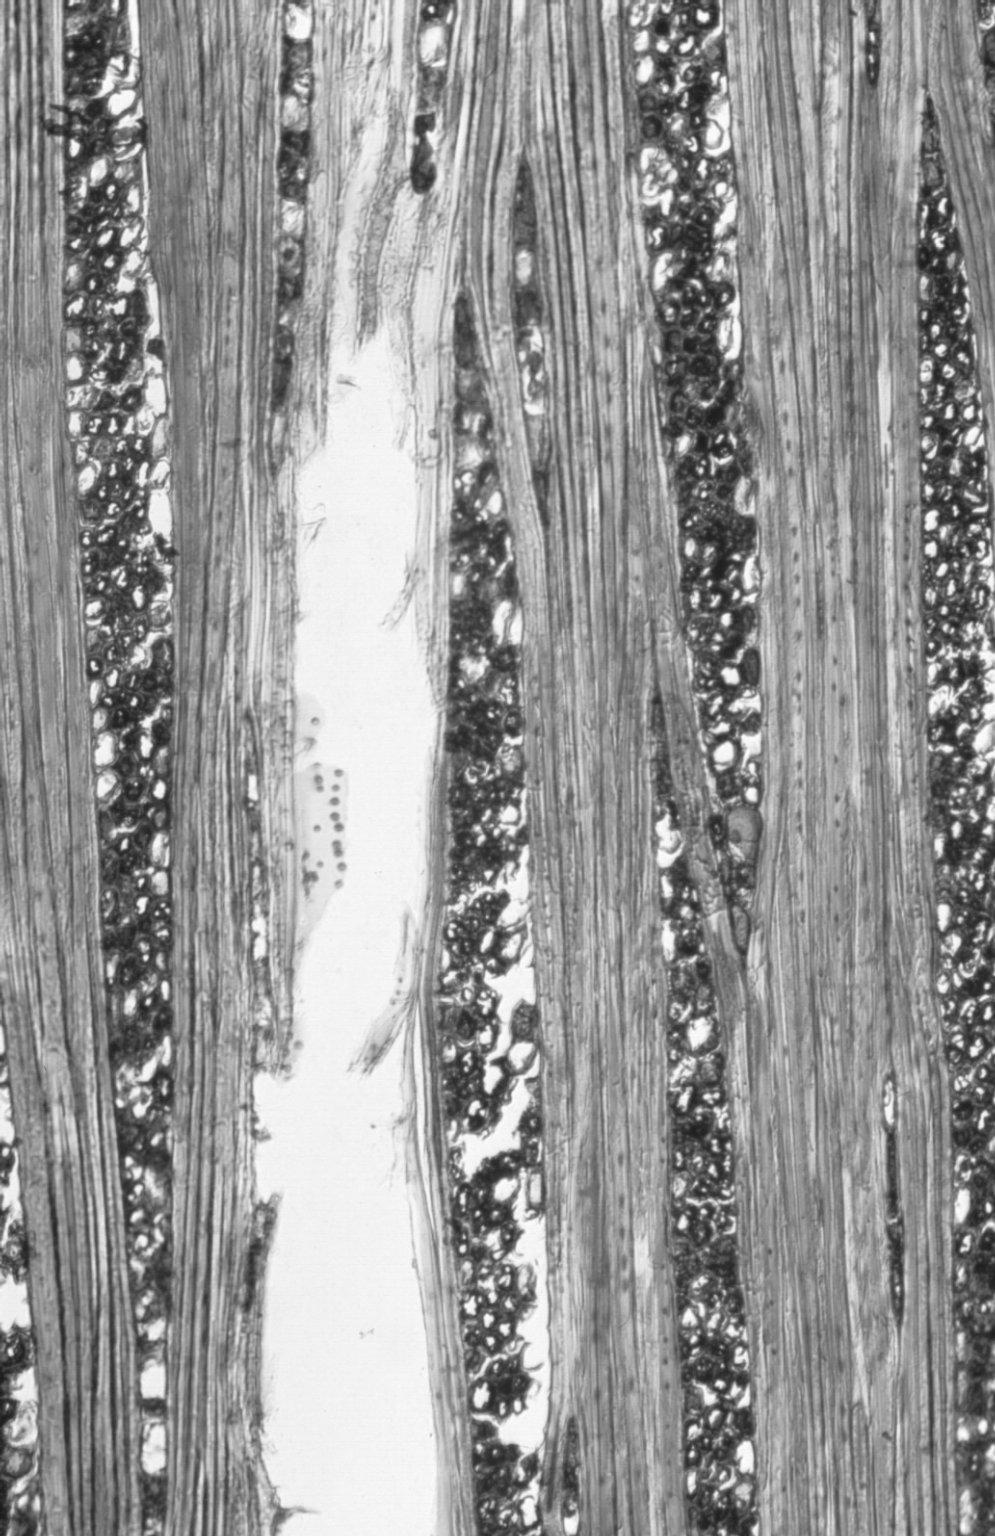 DIPTEROCARPACEAE Dipterocarpus confertus